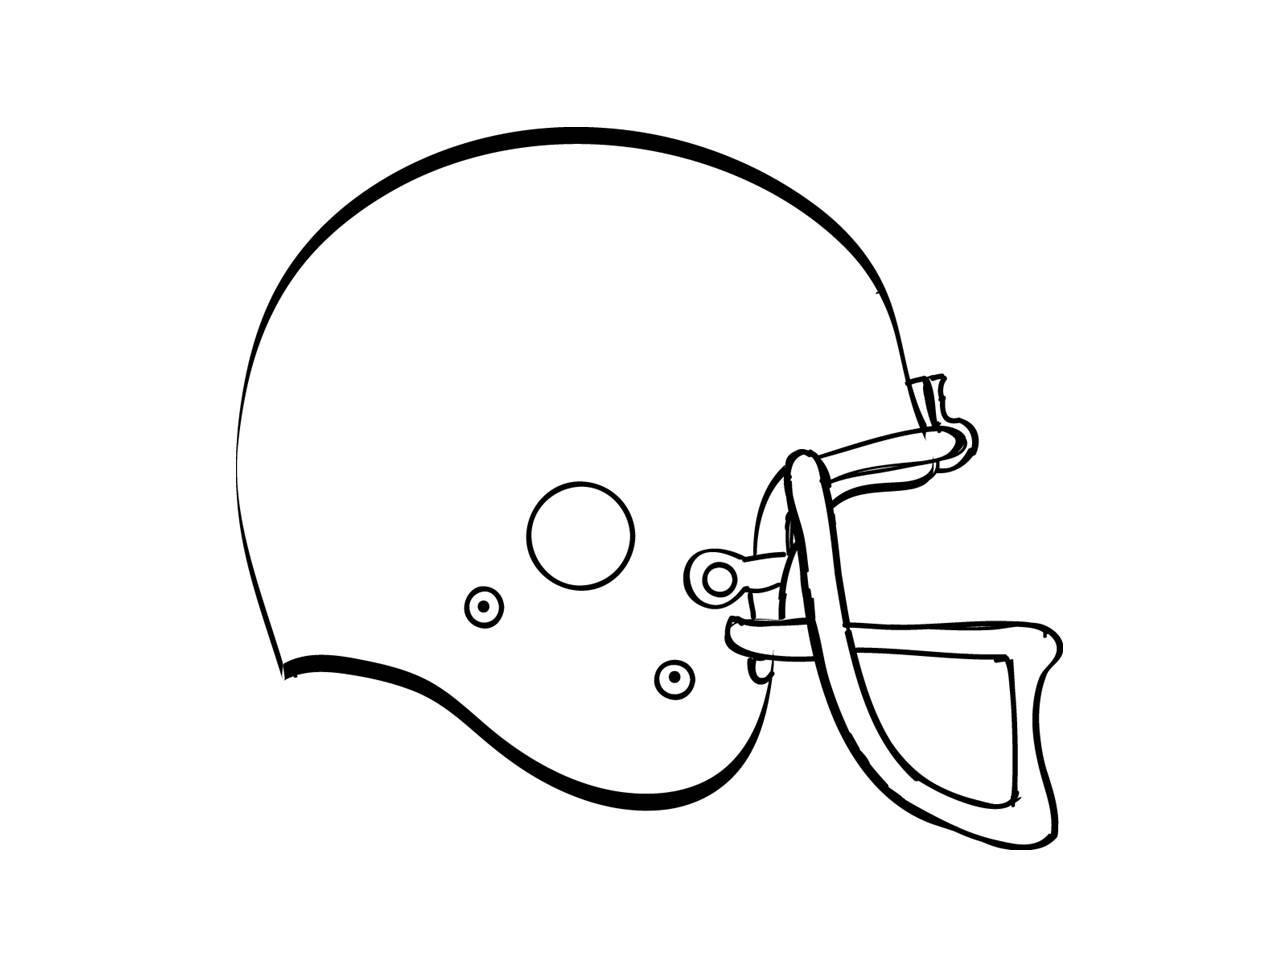 1278x959 Drawn Football Blank